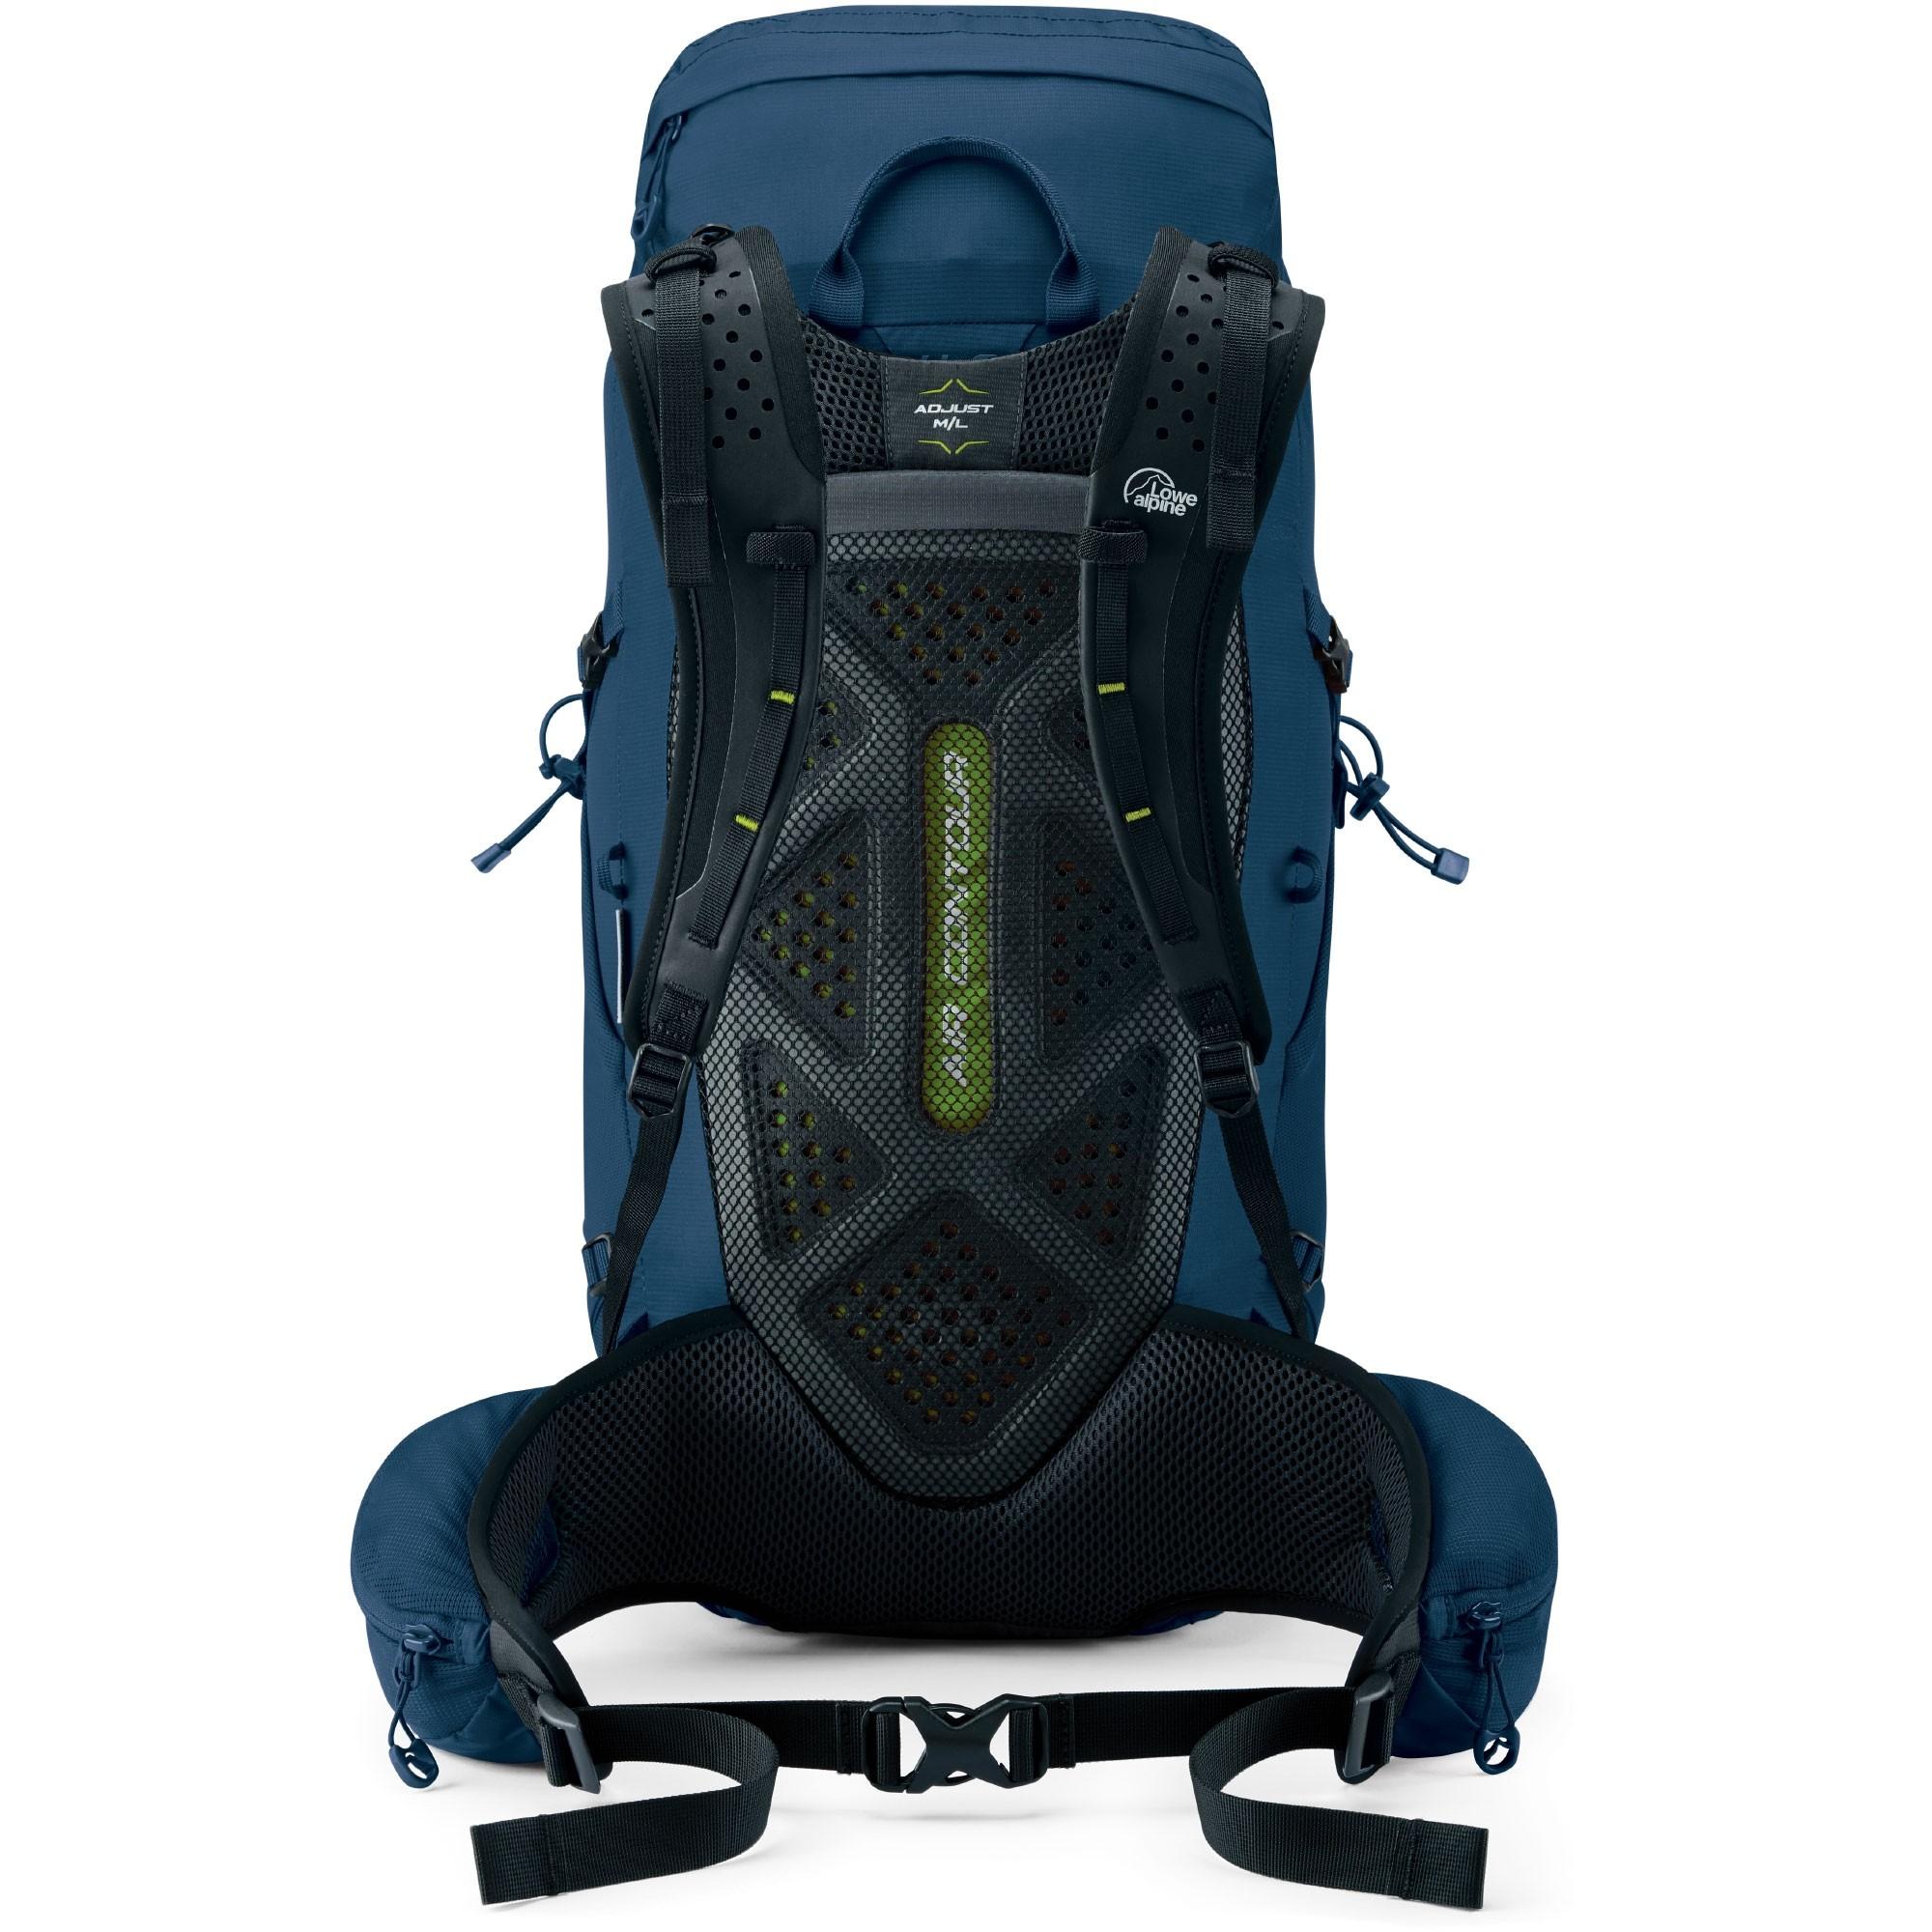 Lowe Alpine Aeon 35 Rucksack - Azure - Back System